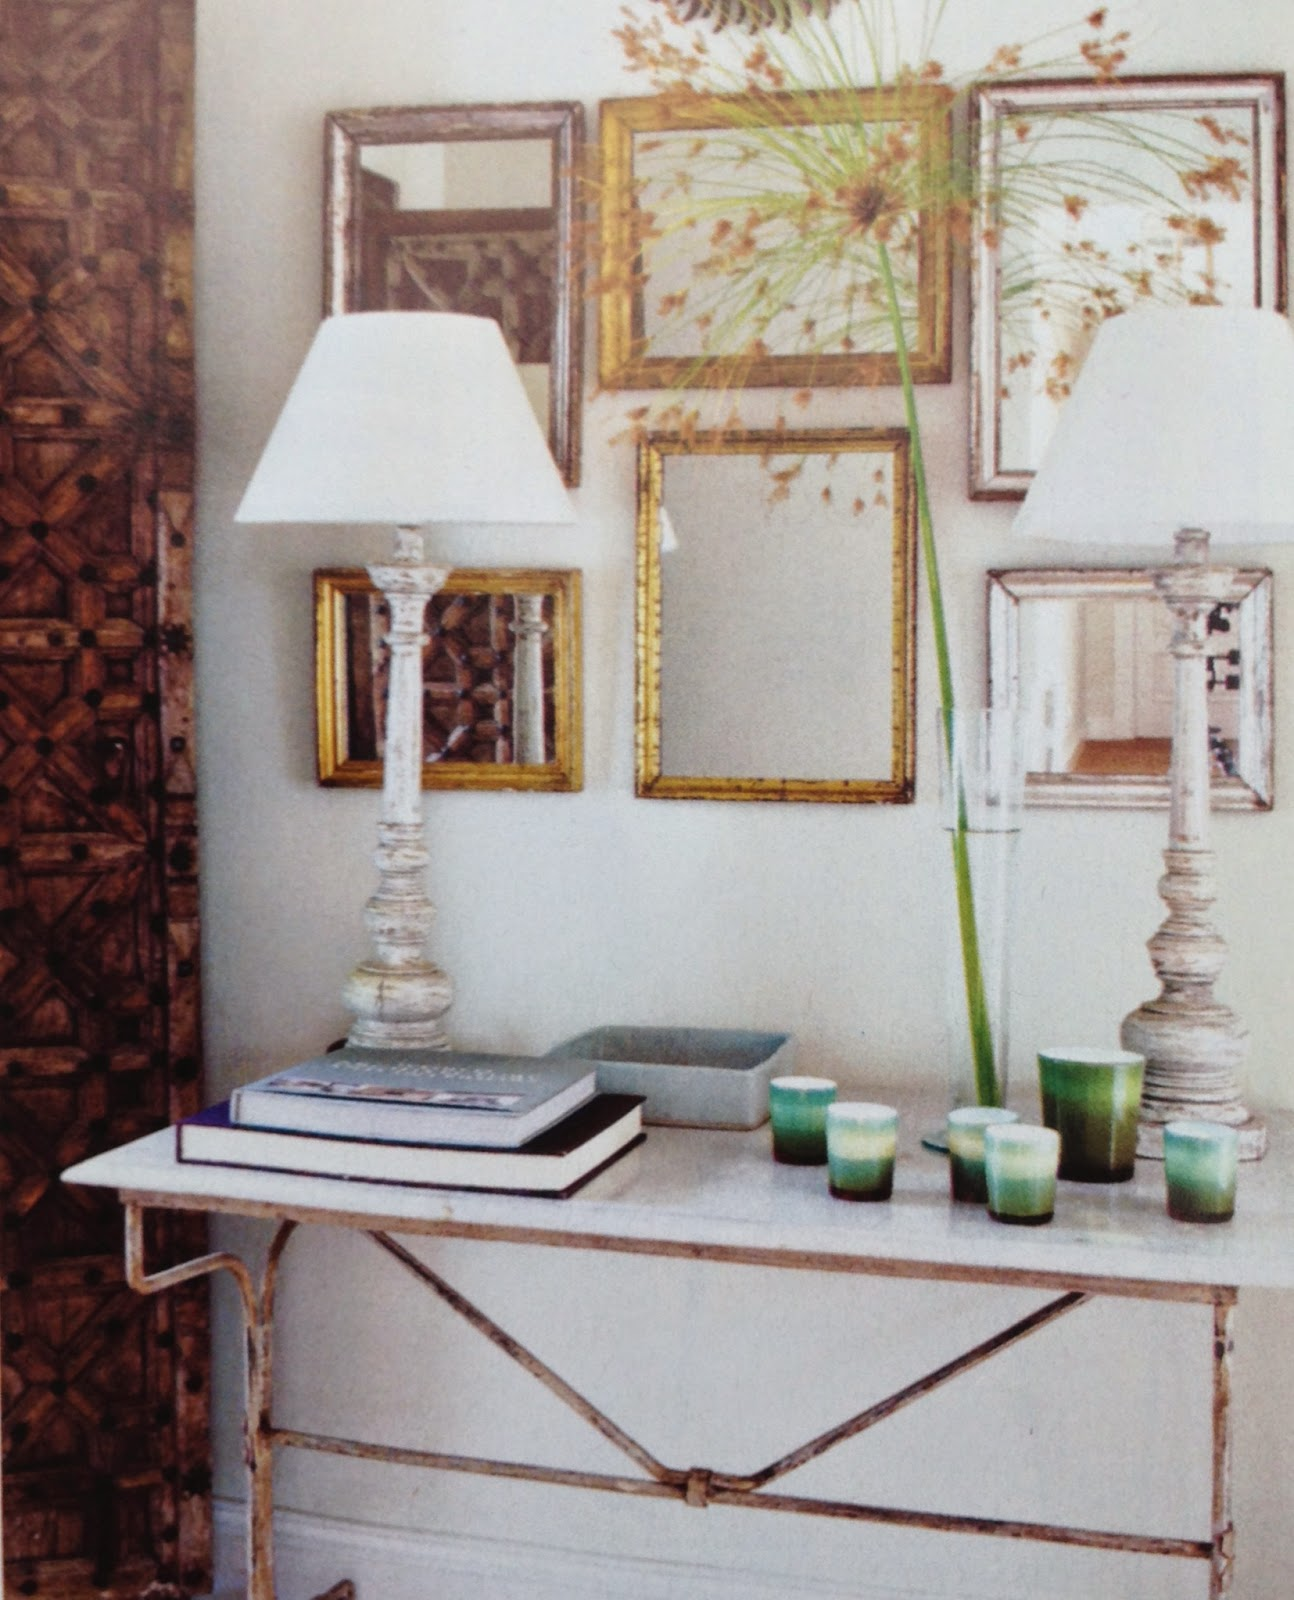 Espejo archivos rojosill n for Espejos decorativos para chimeneas